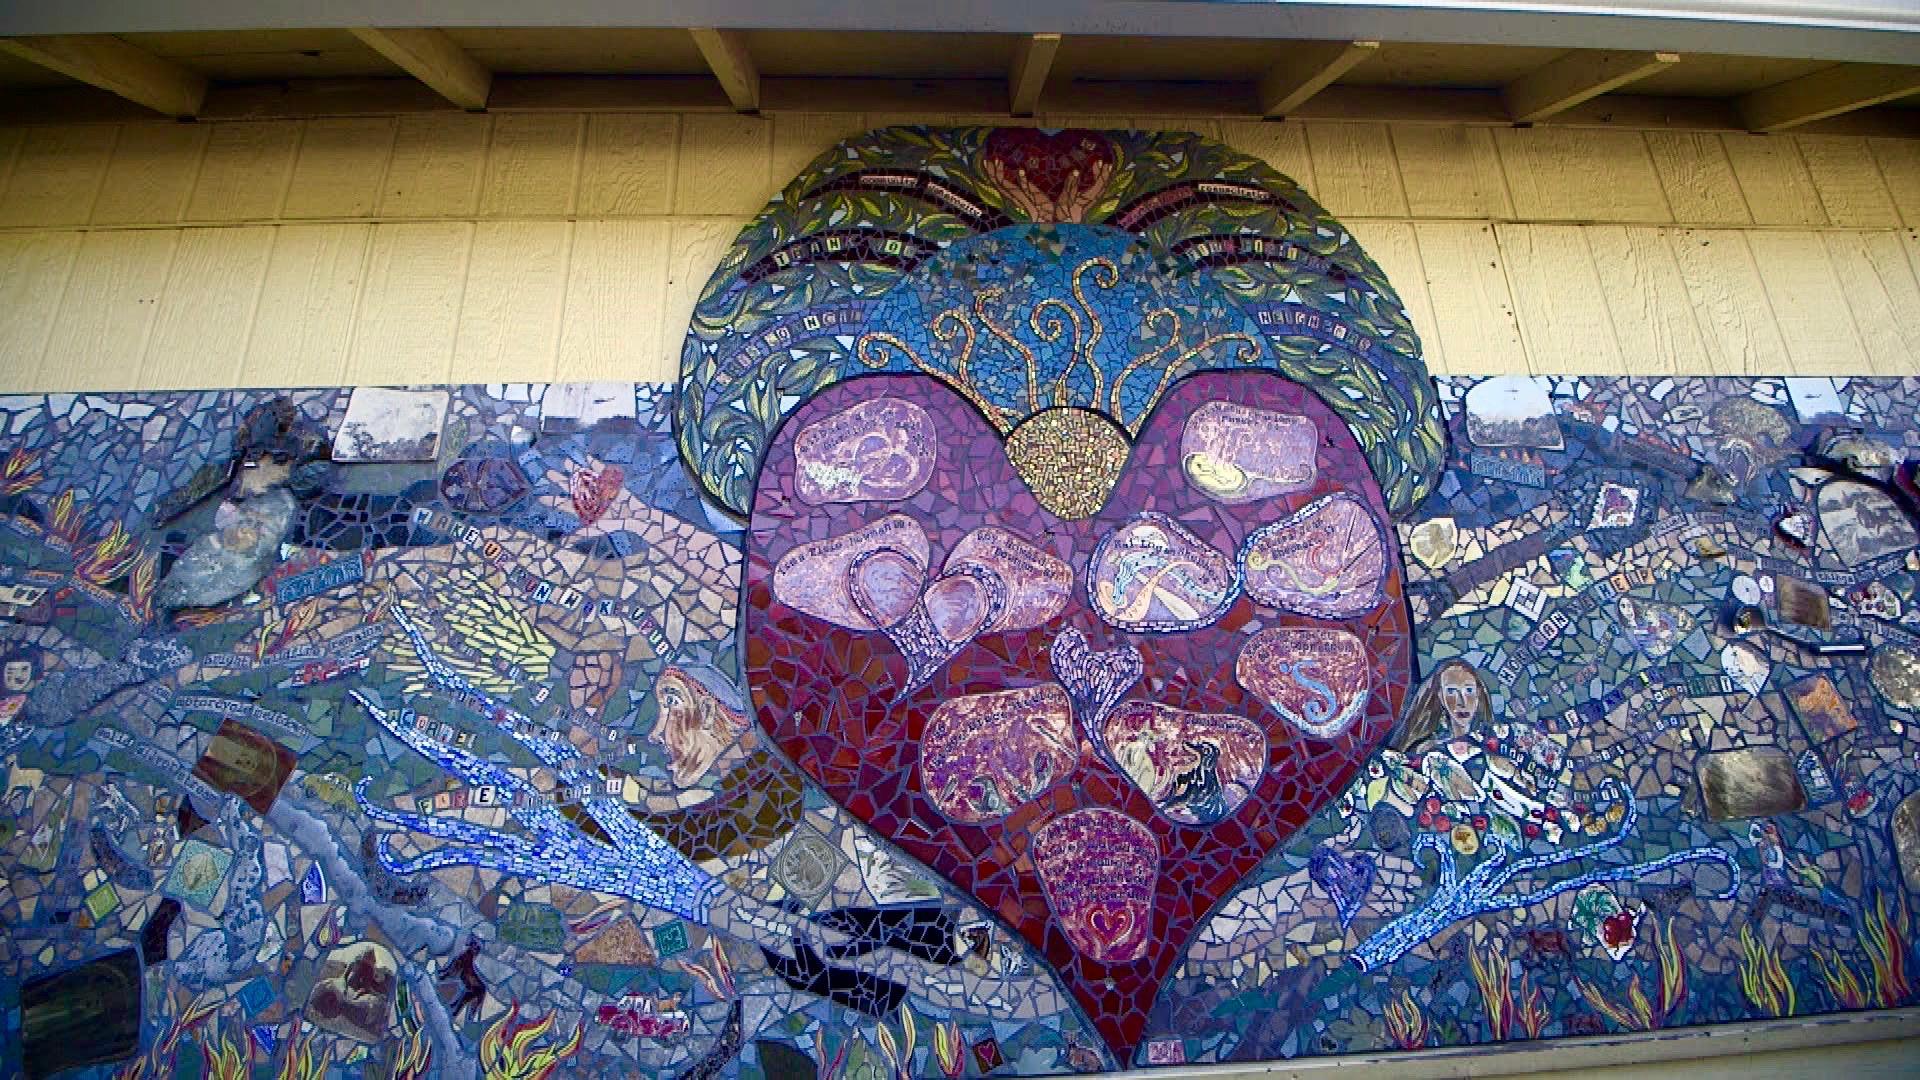 Mendocino County Community Remembers Tragic Fire Through Art